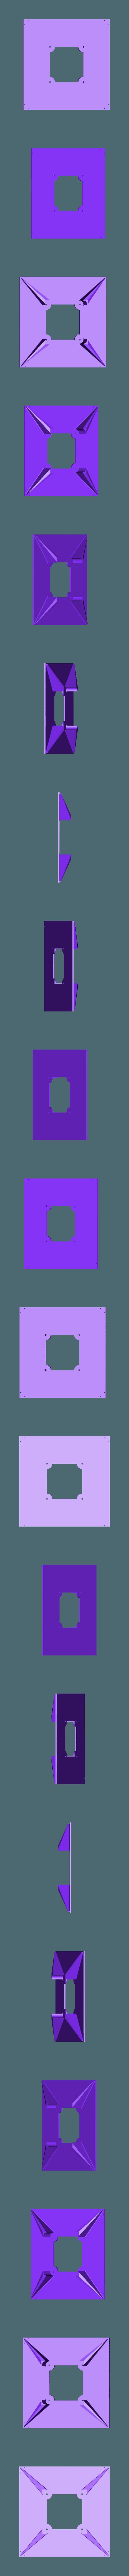 base_sup%C3%A9rieure.stl Download free STL file Japanese style light box • Design to 3D print, jurekkb